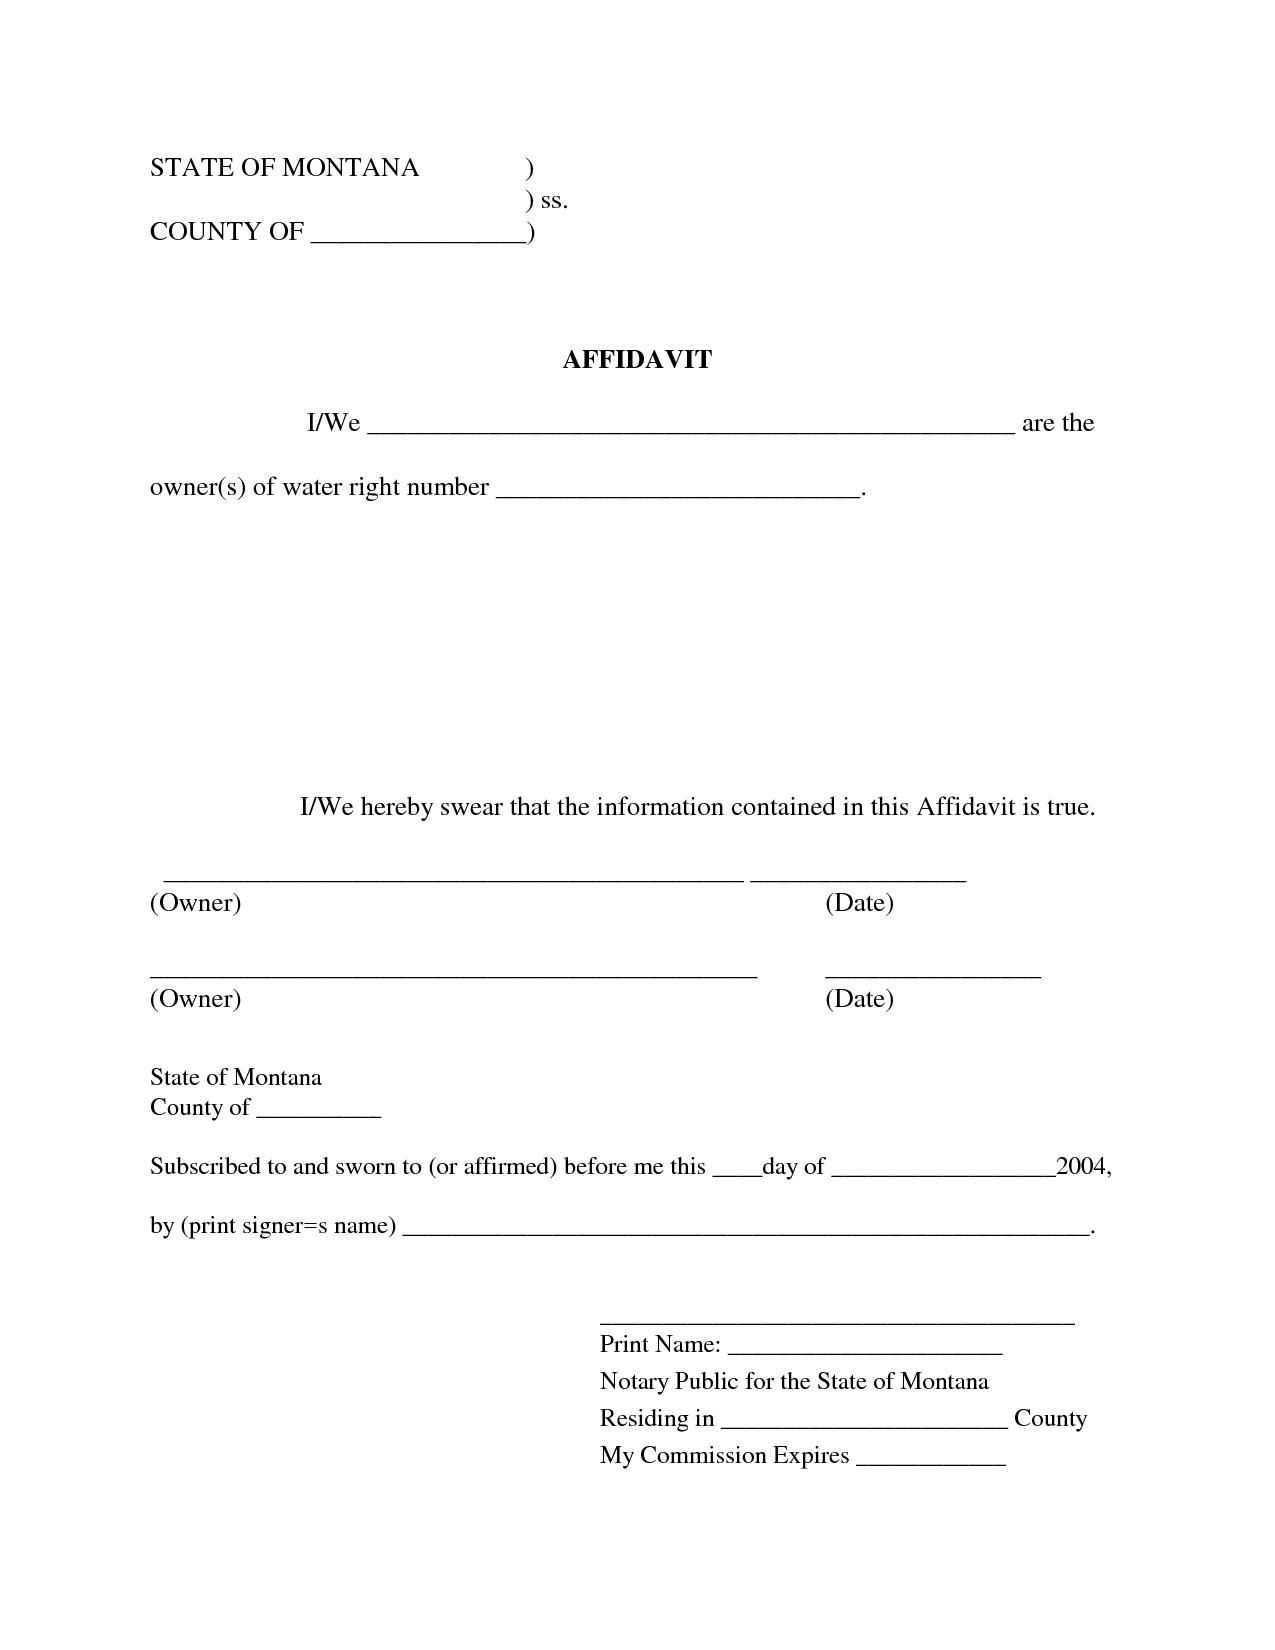 Free Blank Affidavit Form | Blank Sworn Affidavit Forms | Kiss68One - Free Printable Blank Affidavit Form